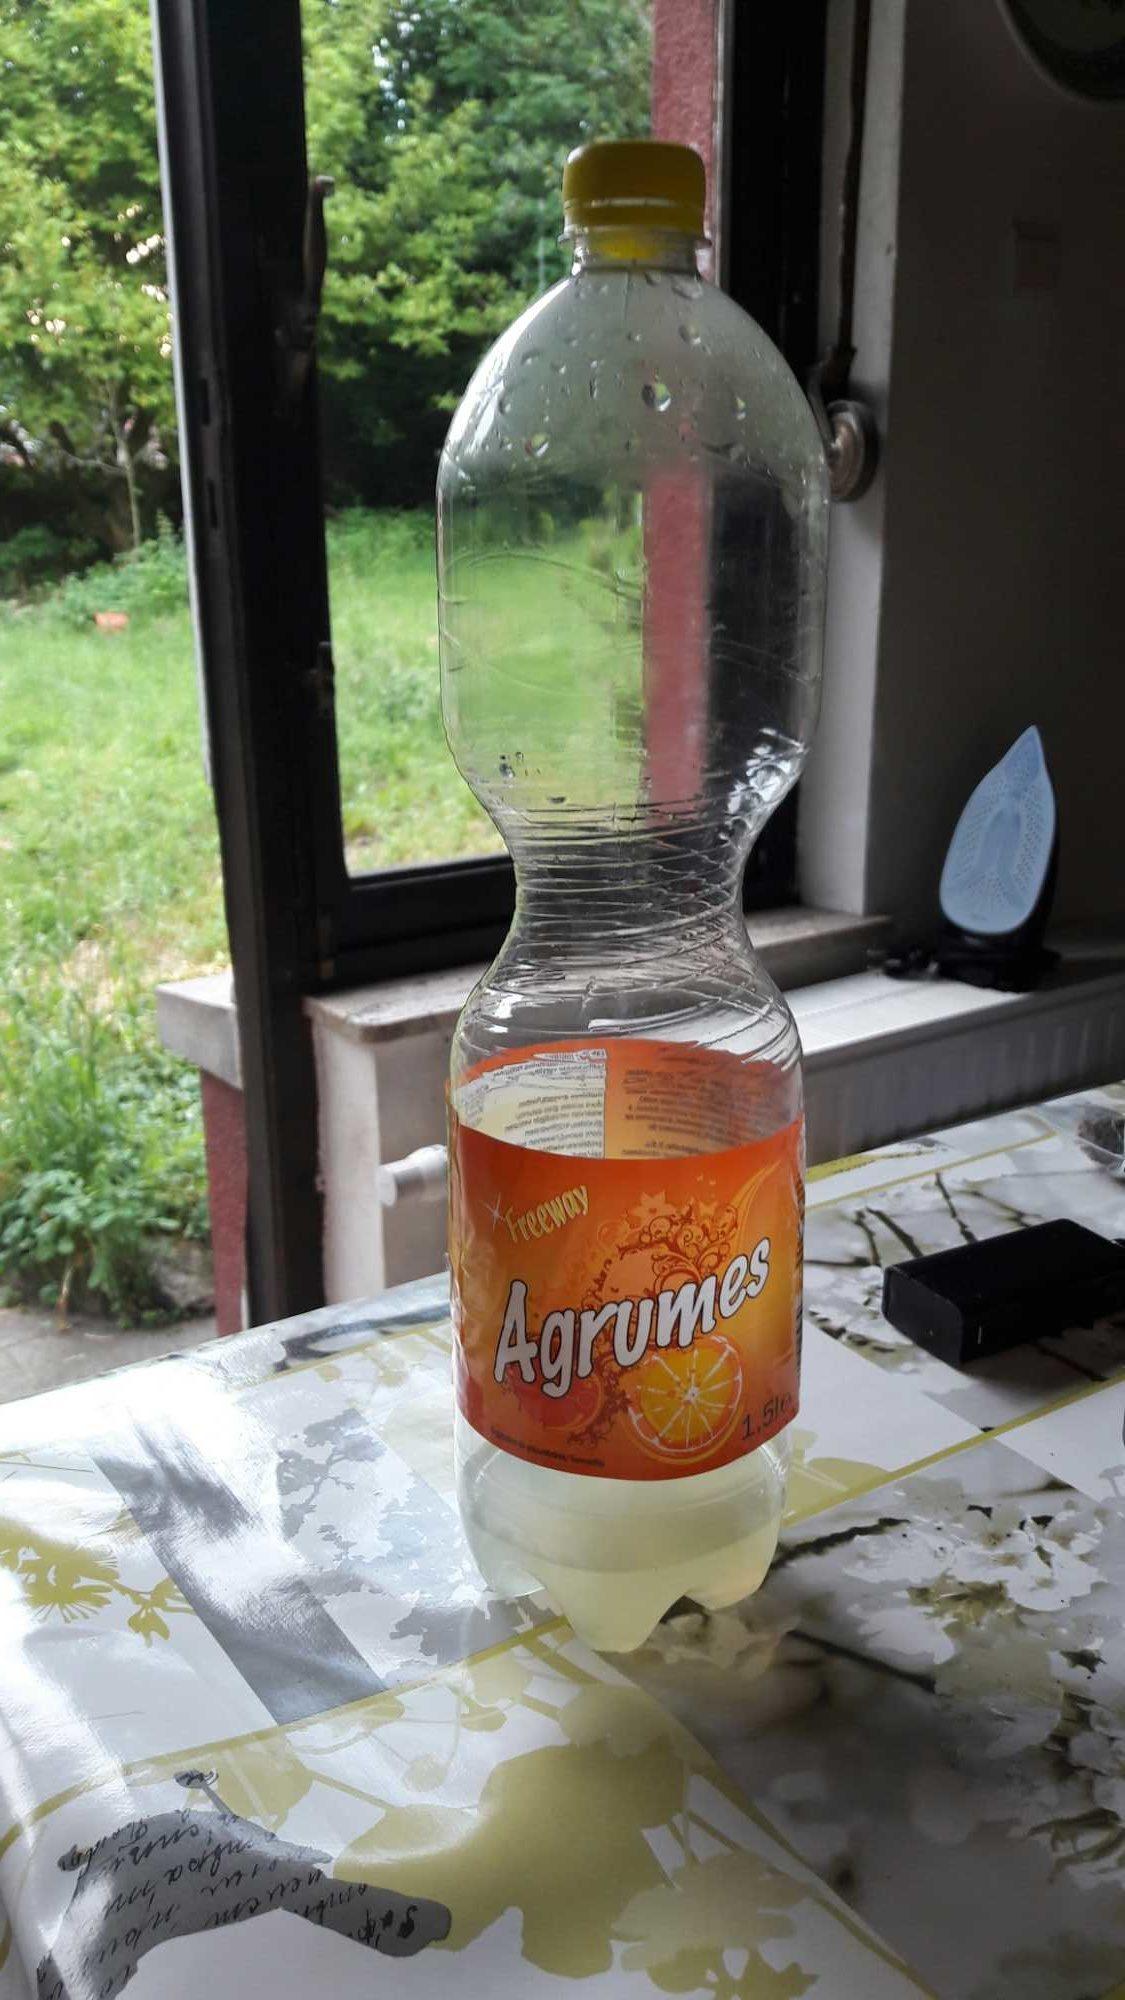 Freeway Agrume - Product